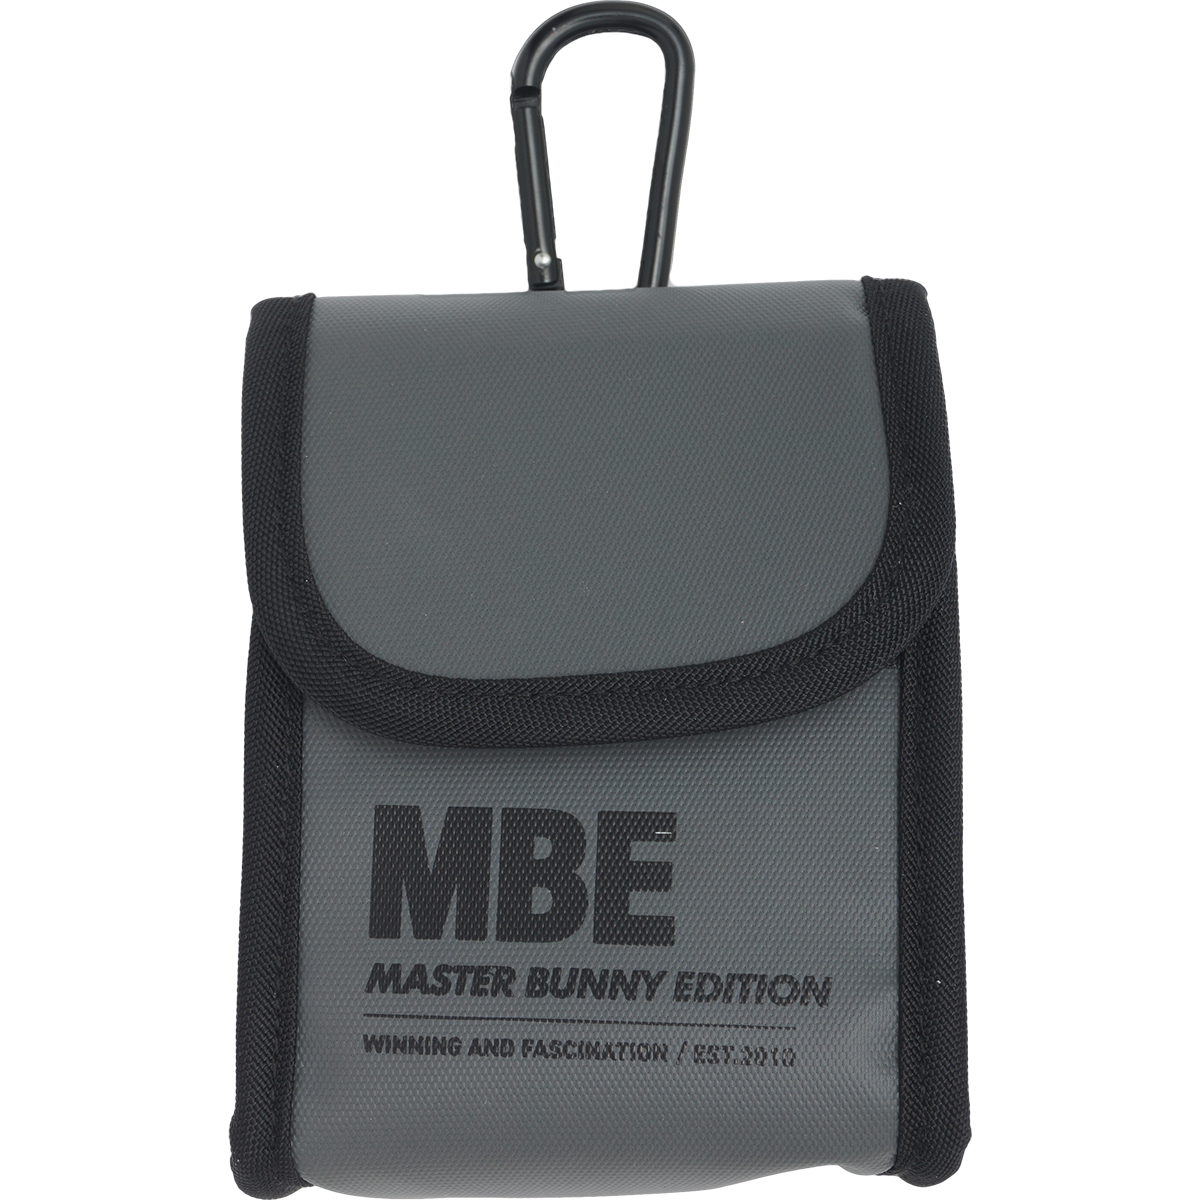 MBE測定器ケース